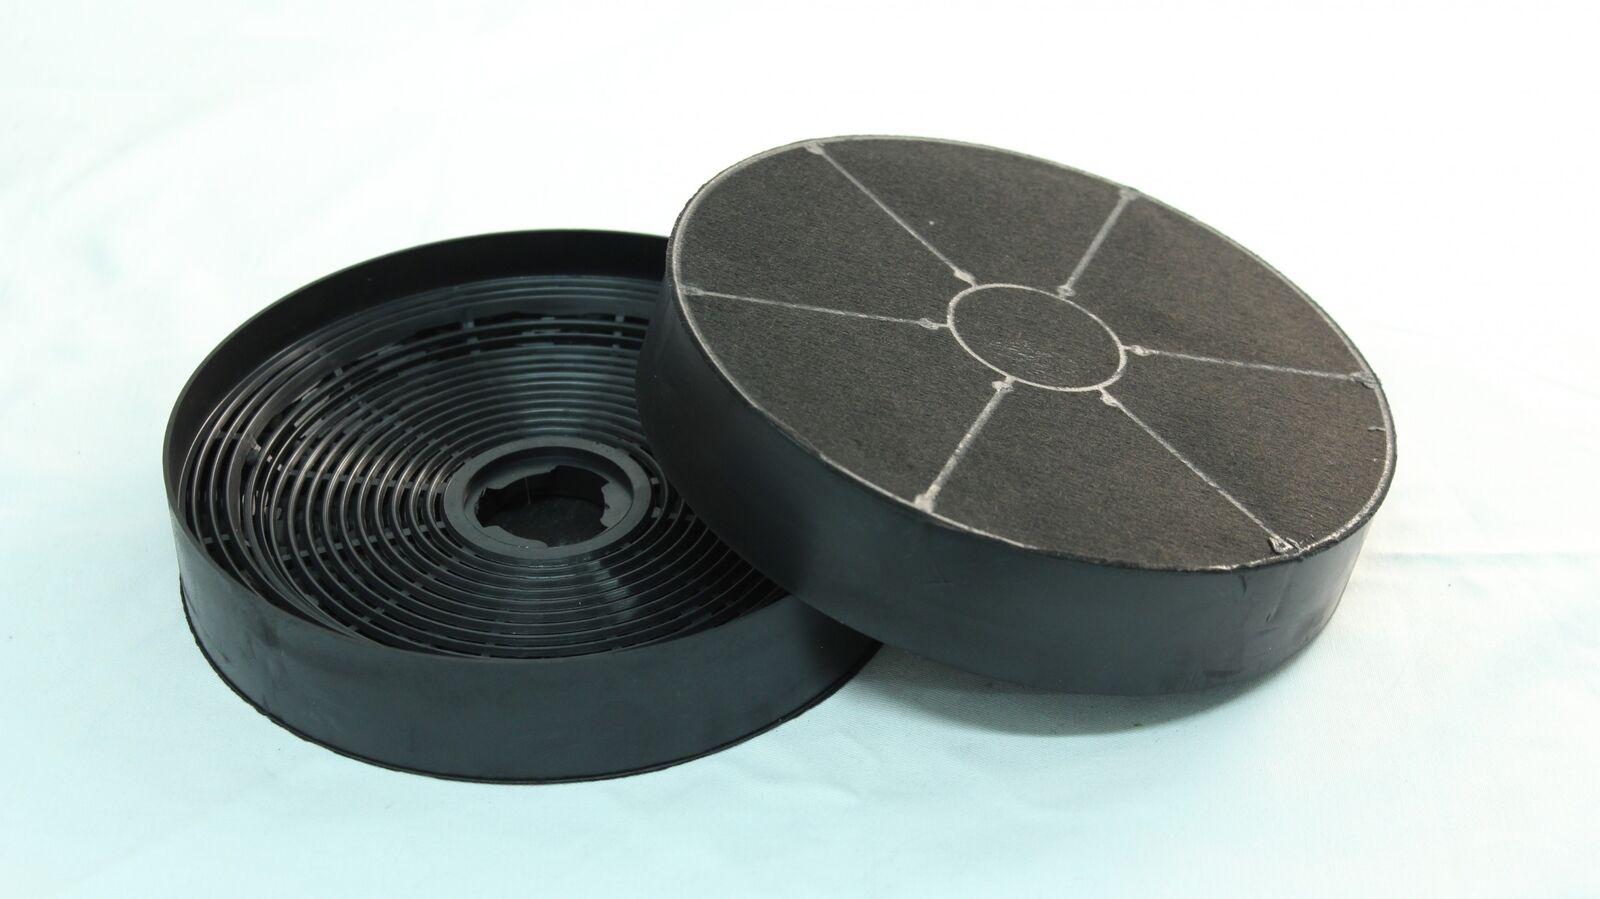 Aeg dunstfilter fett filter metall gitter abzugs